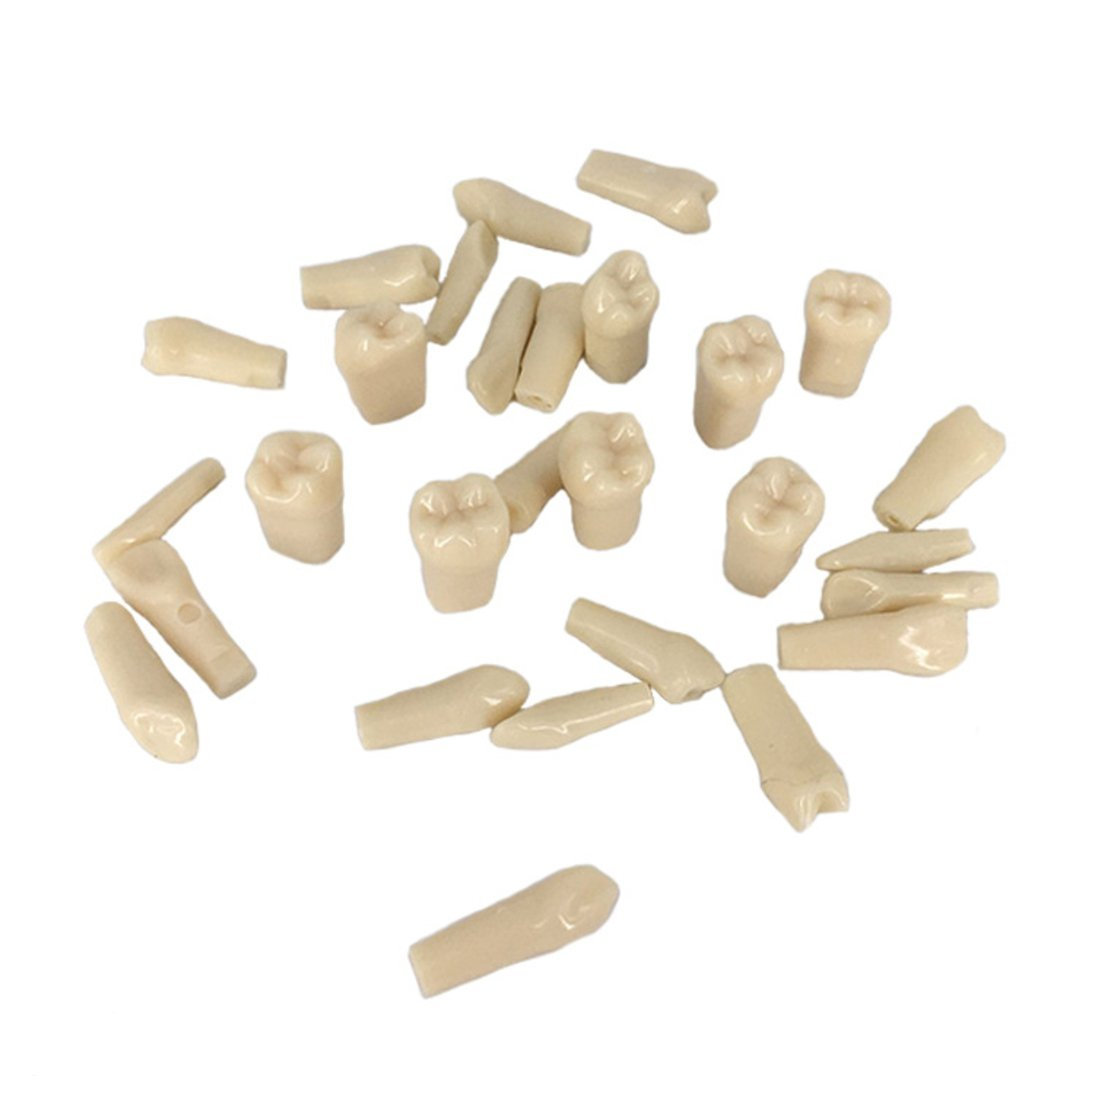 YOUYA DENTAL Replace Teeth Whole Set 28 Pcs Spare Teeth TM-021 Learning Model